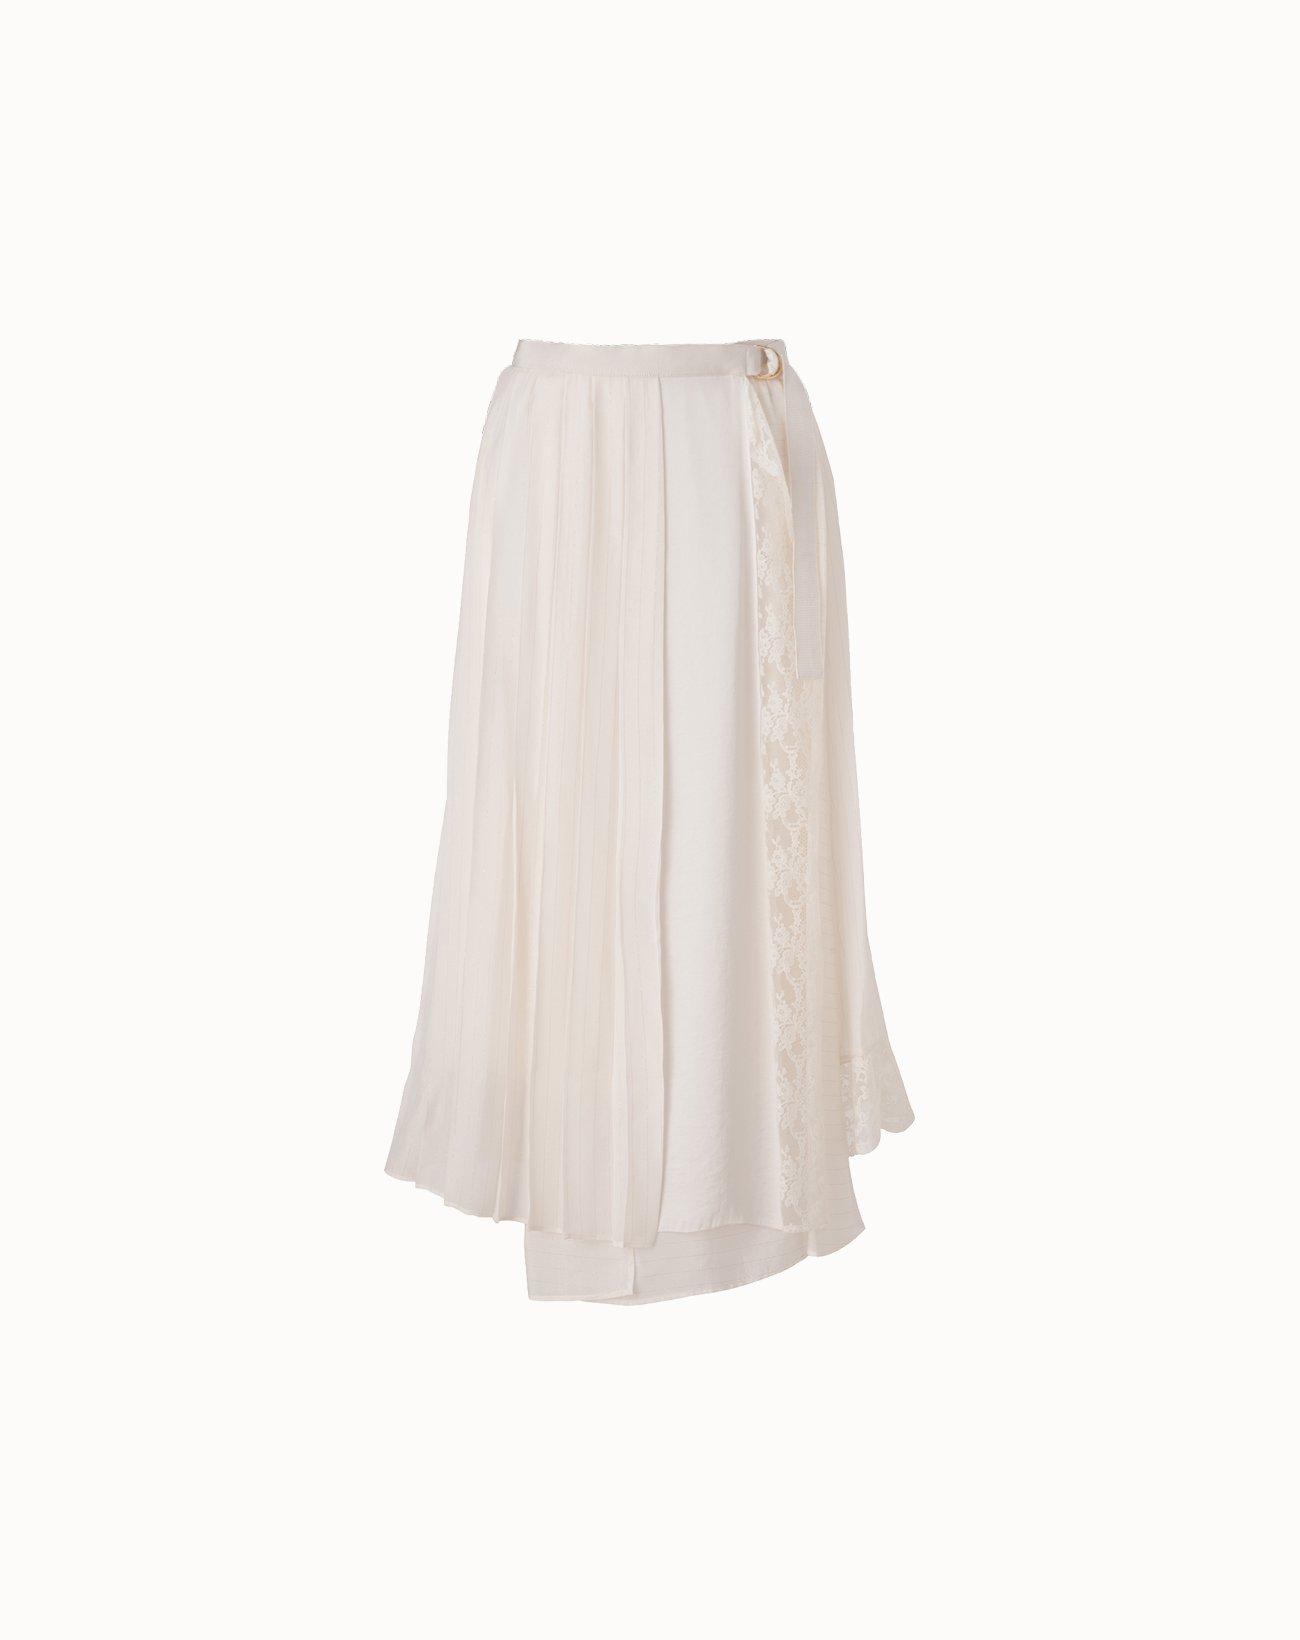 Cupro Stripe Skirt - Off White